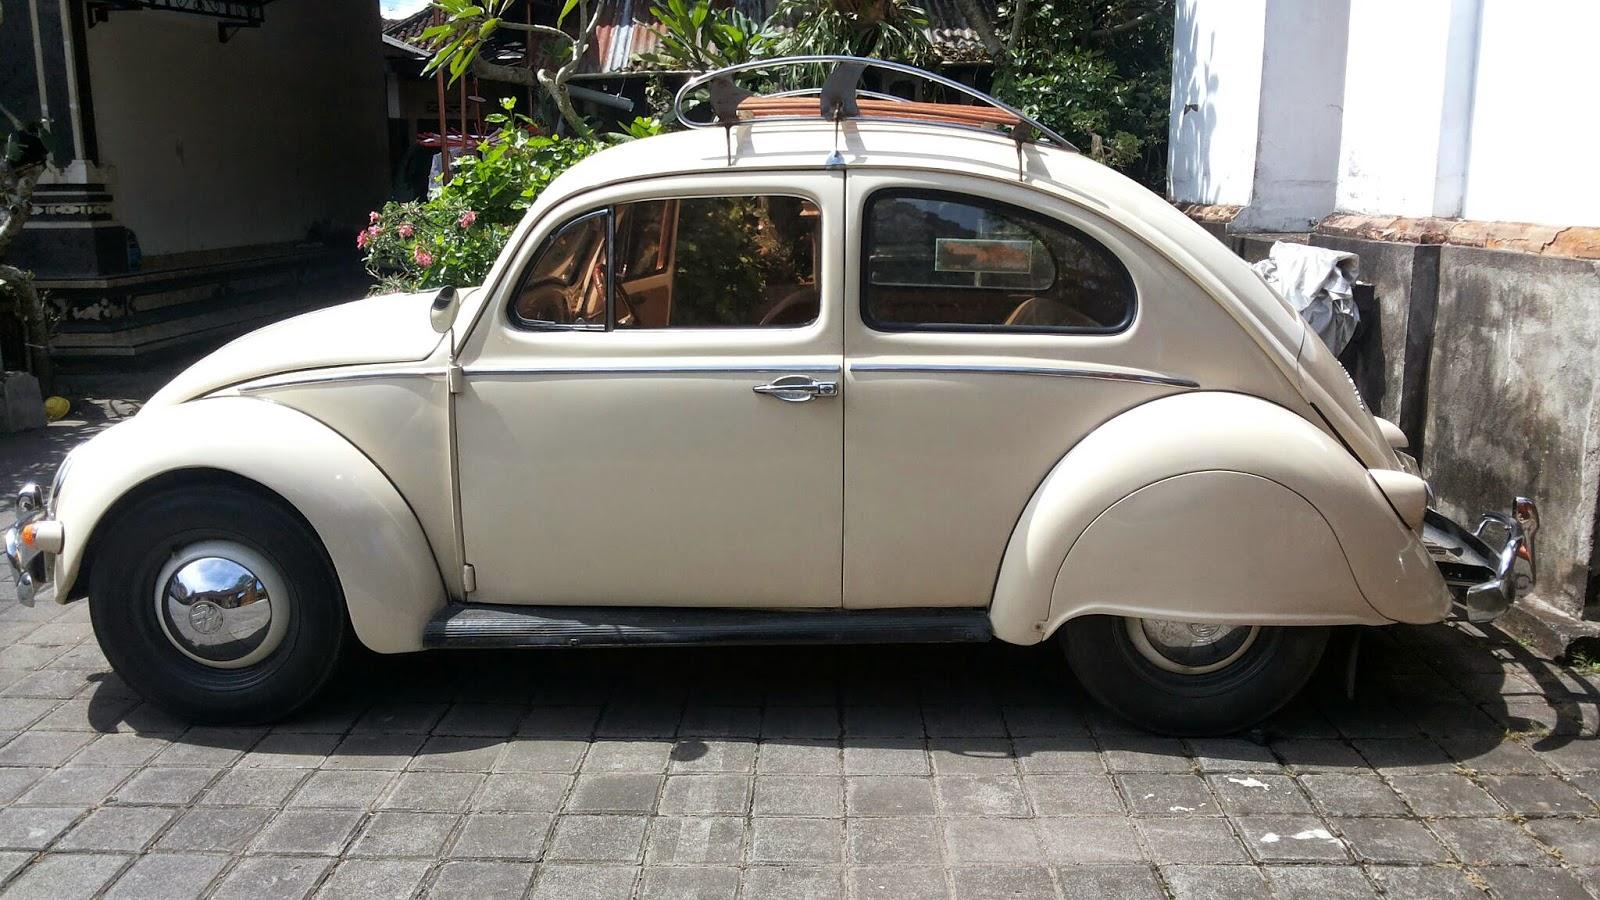 Dijual mobil VW kodok oval tahun 1957  vmancer